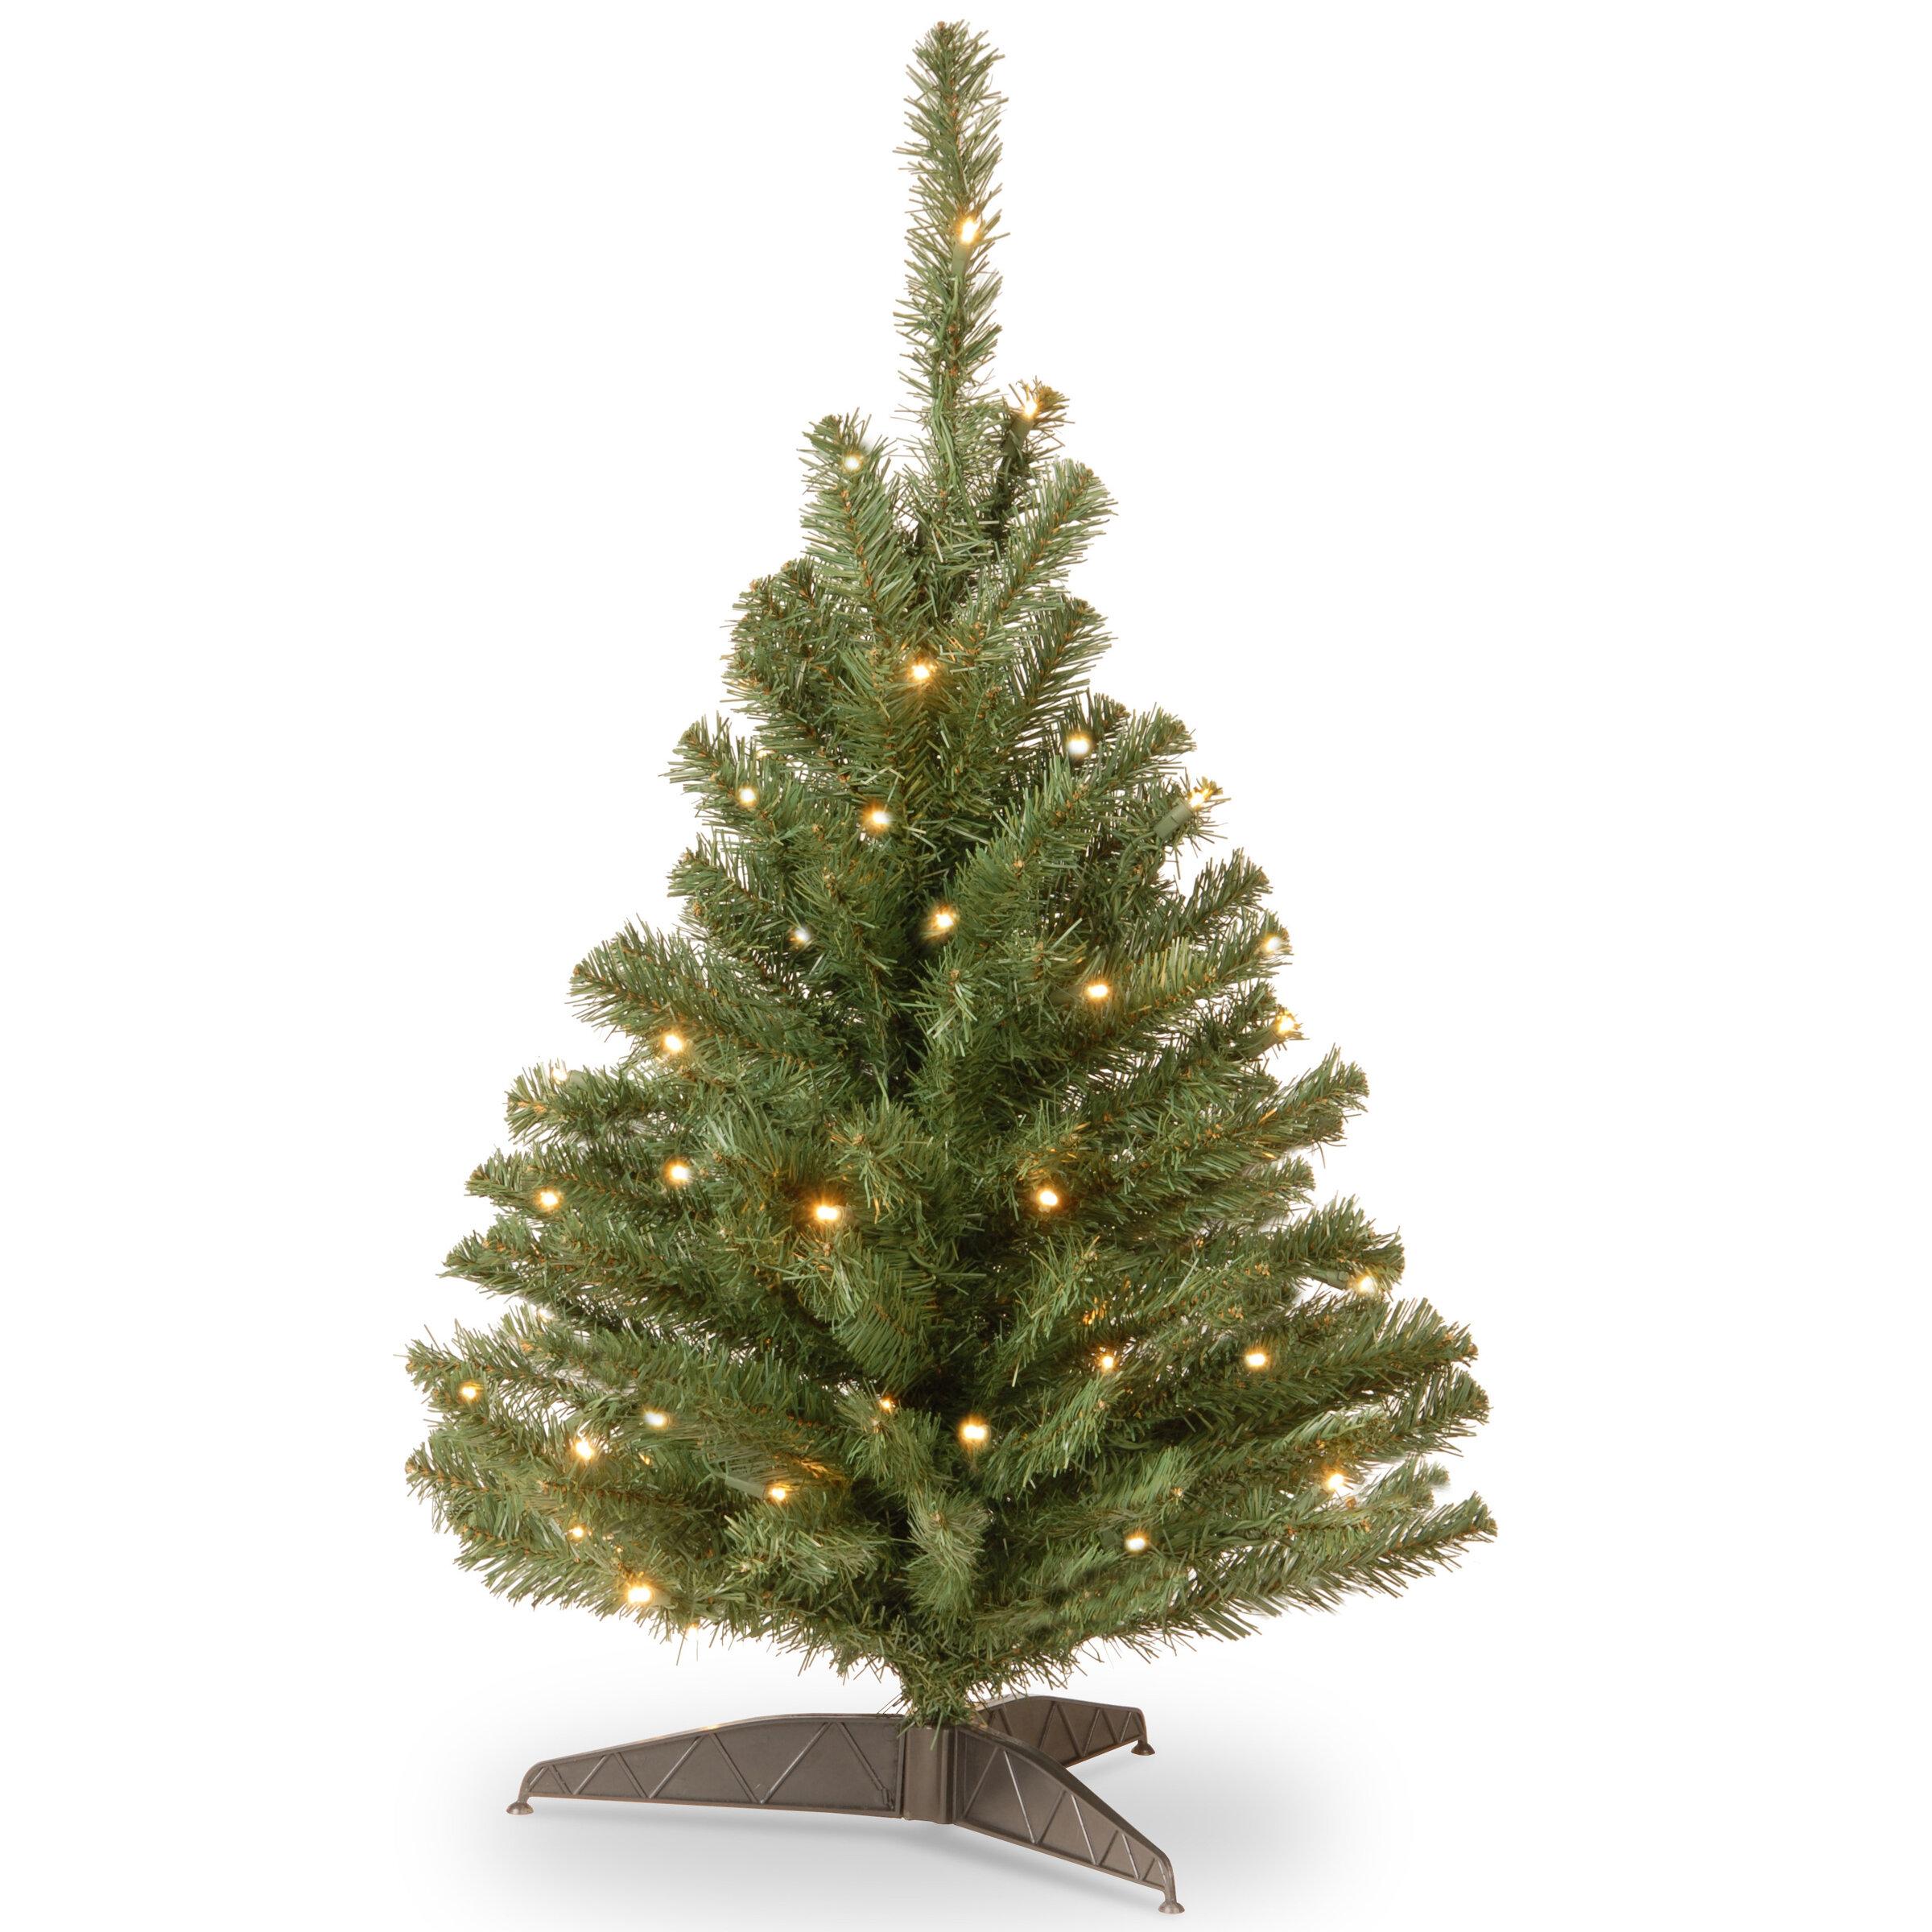 Ebern Designs Kincaid 3\' Green Spruce Trees Artificial Christmas ...